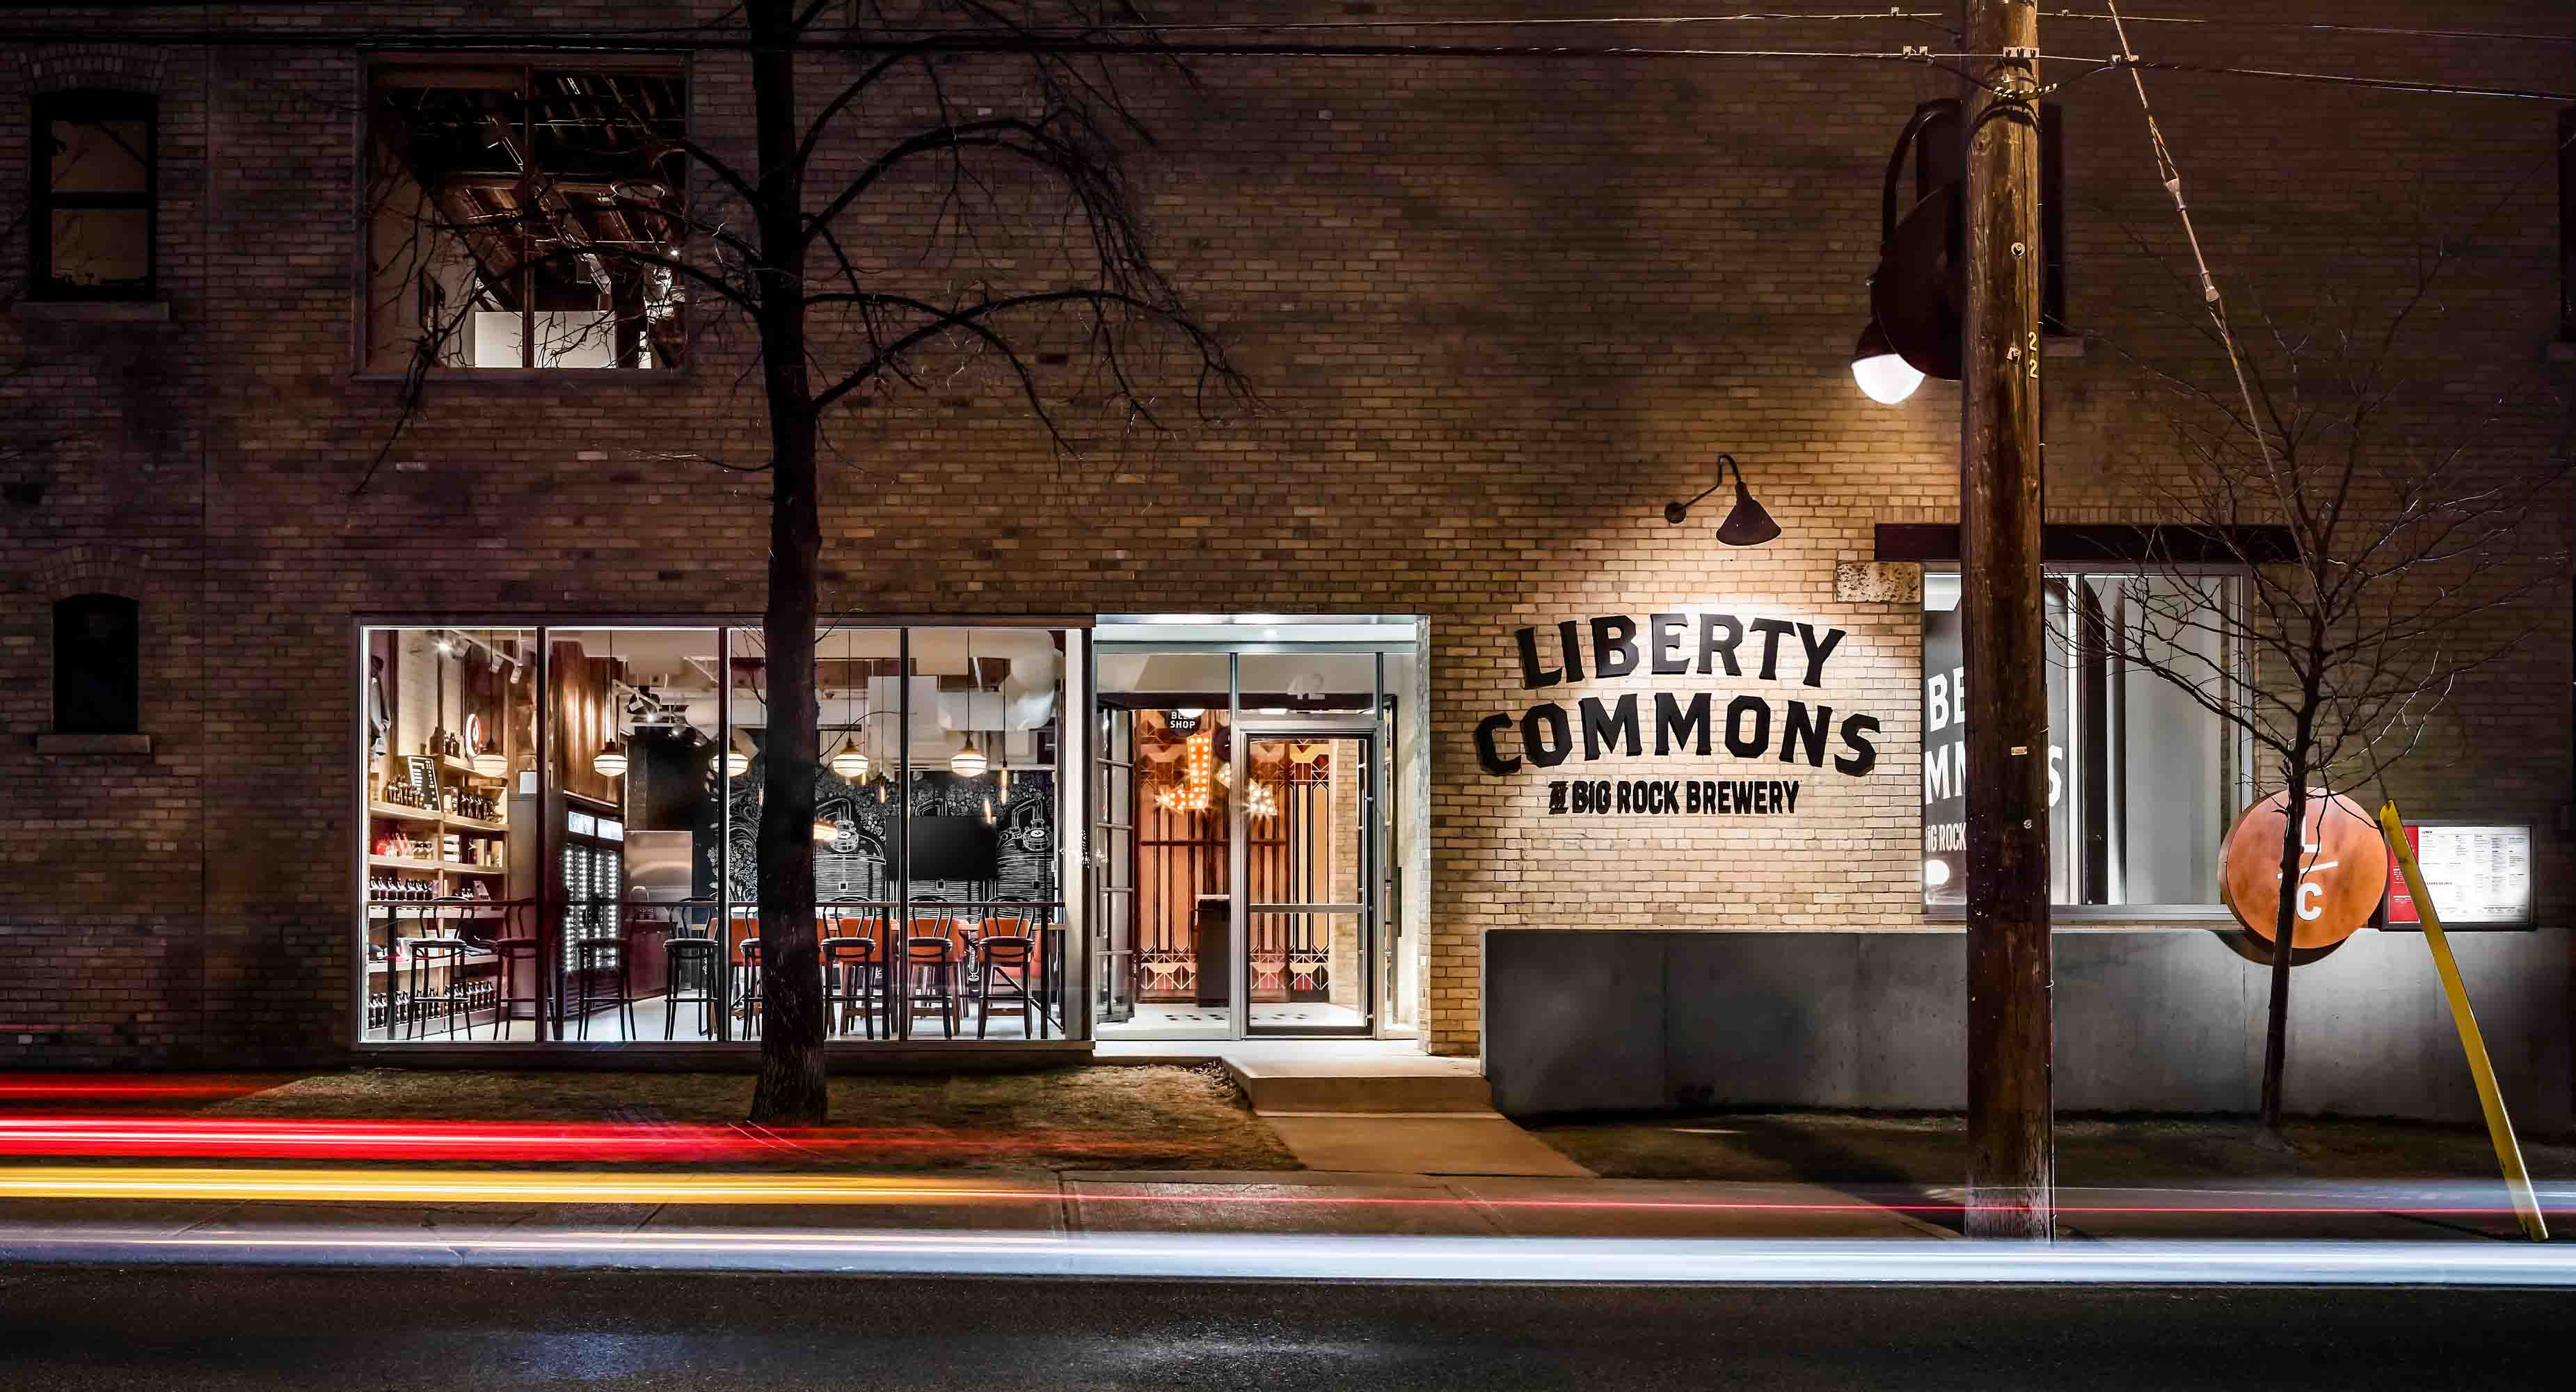 Liberty Commons Restaurant & Bar